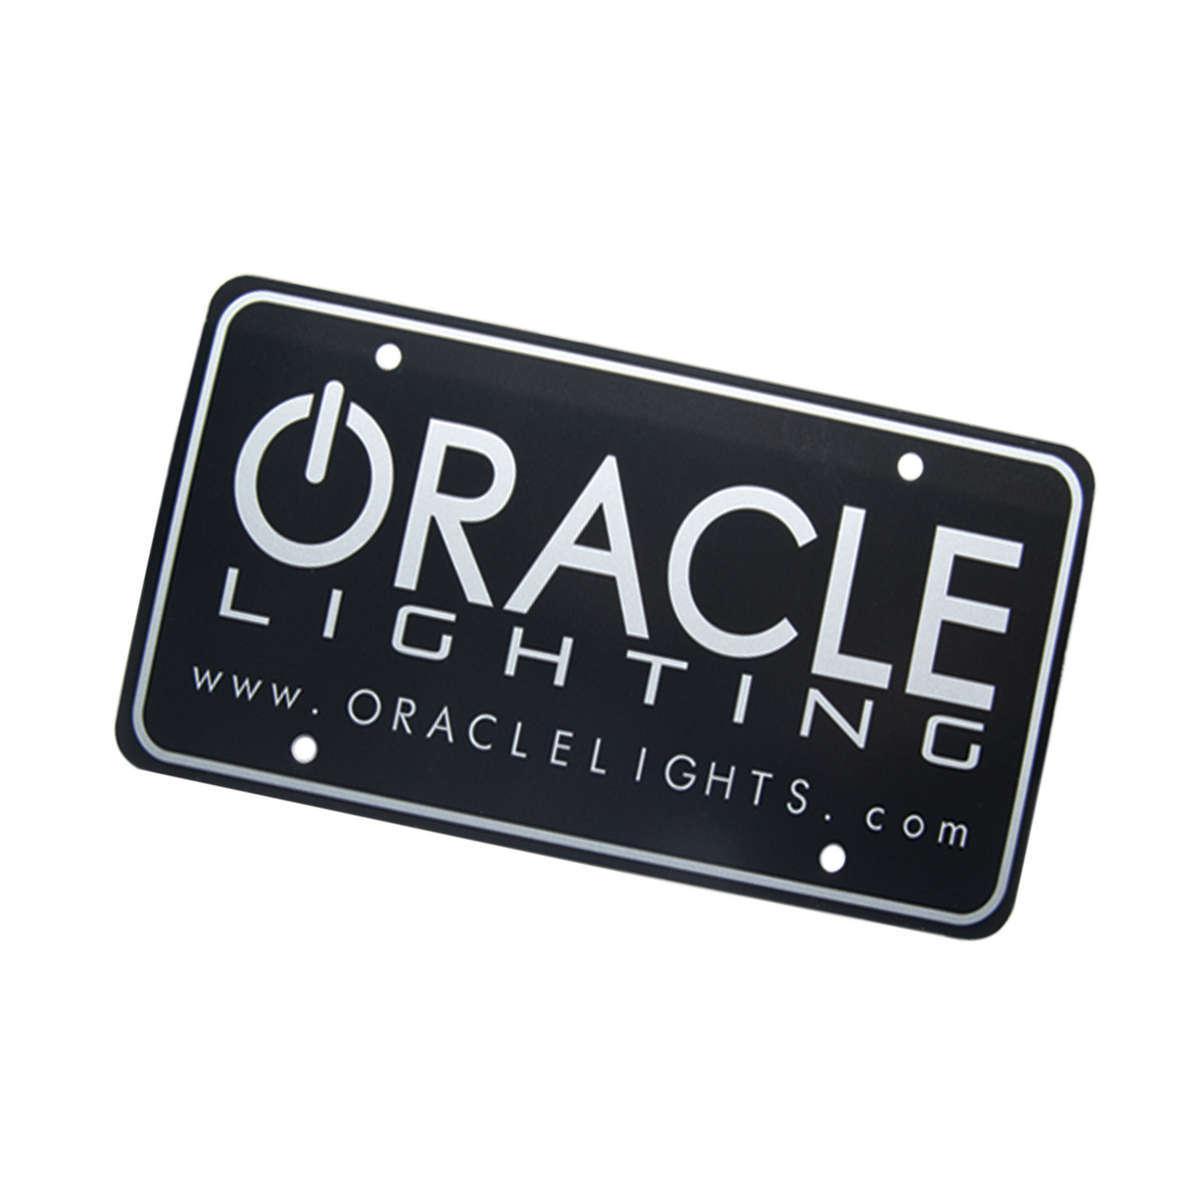 Oracle Lighting Lighting License Plate Plate